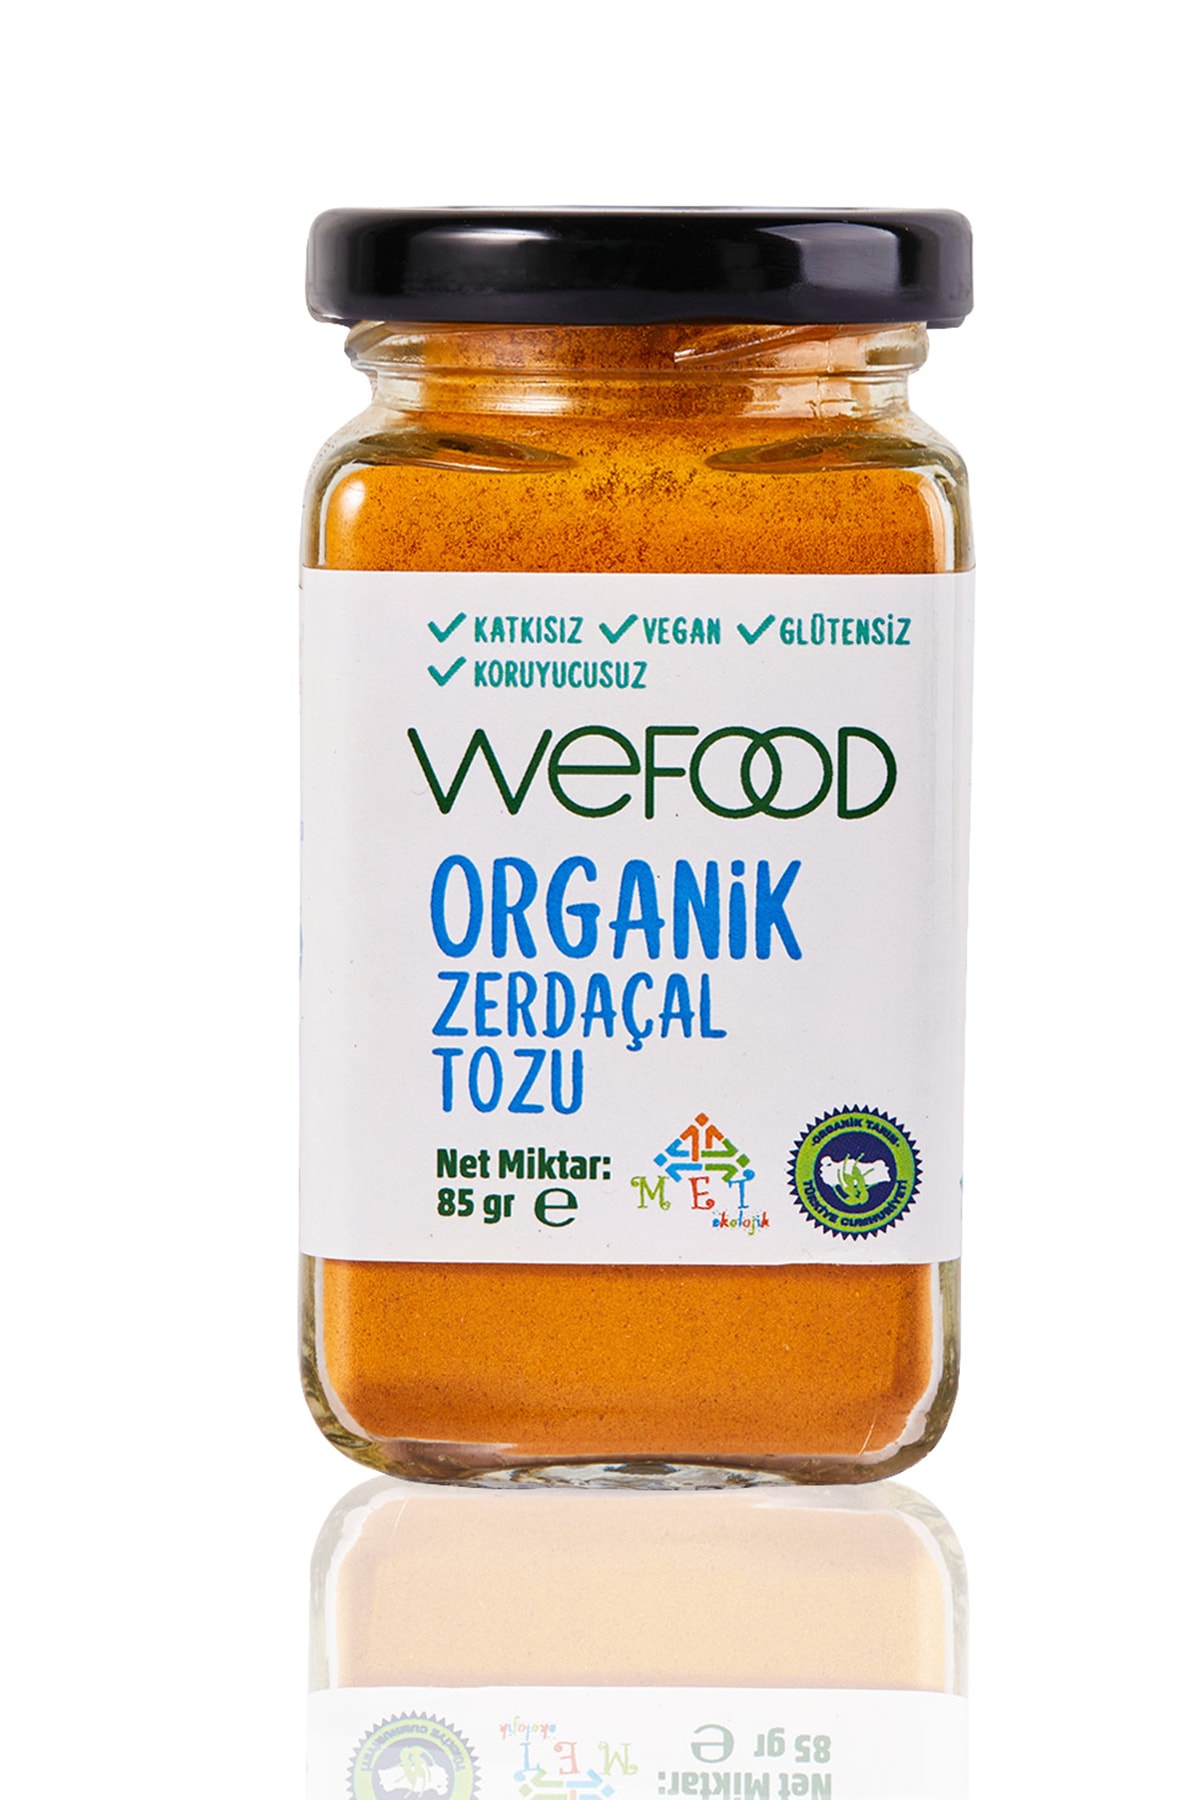 Wefood Organik Zerdeçal Tozu 85 Gr 1